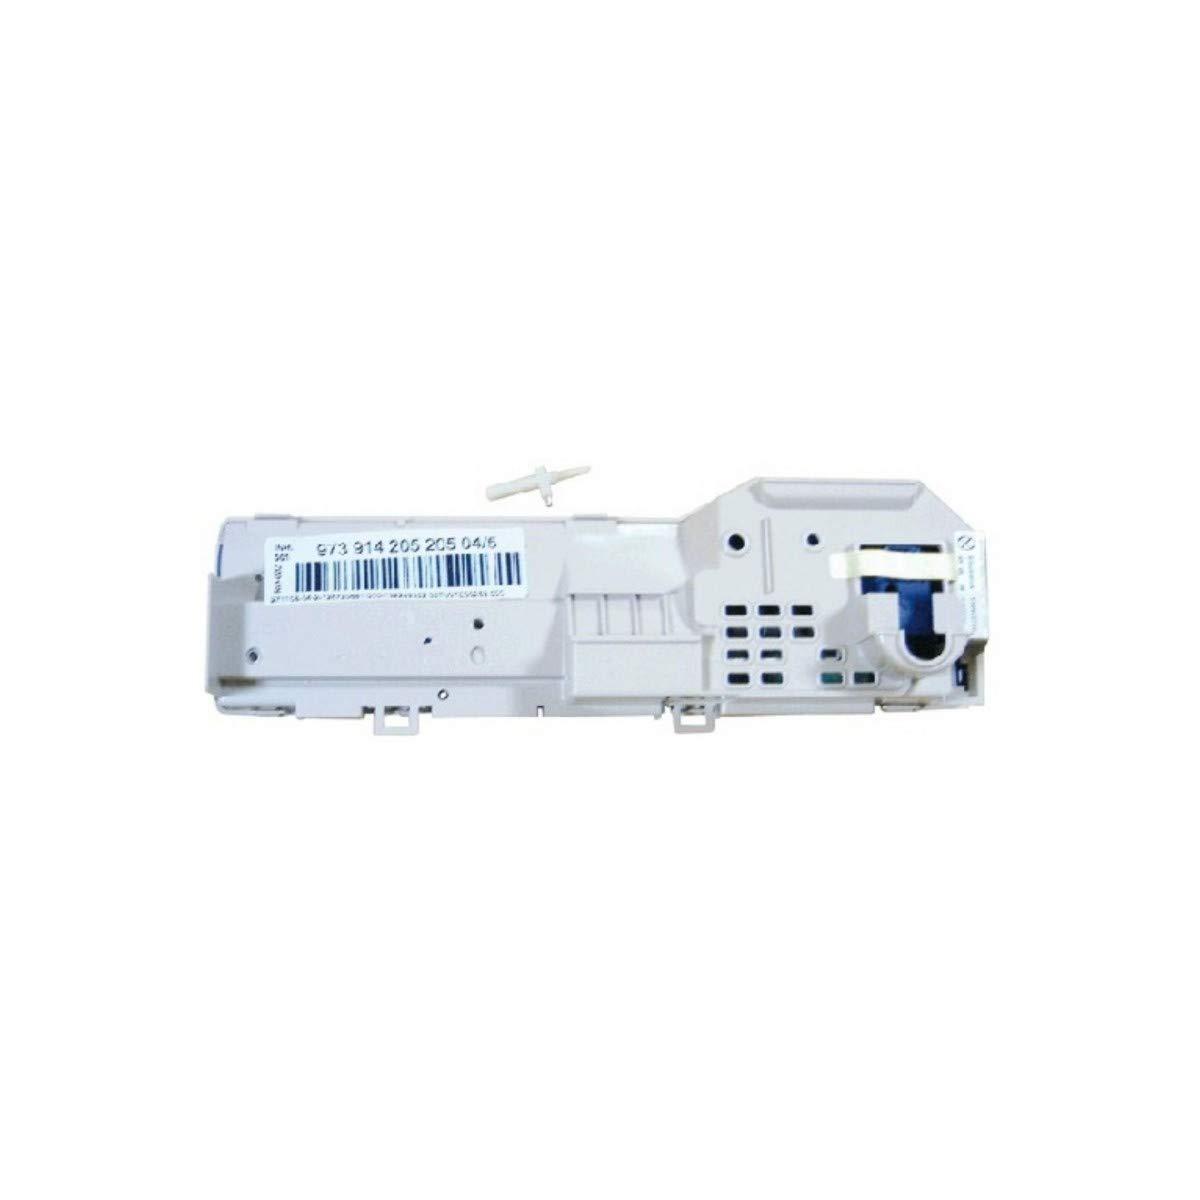 Modulo electronico Lavadora Electrolux ZWG3102 973914205205045 ...